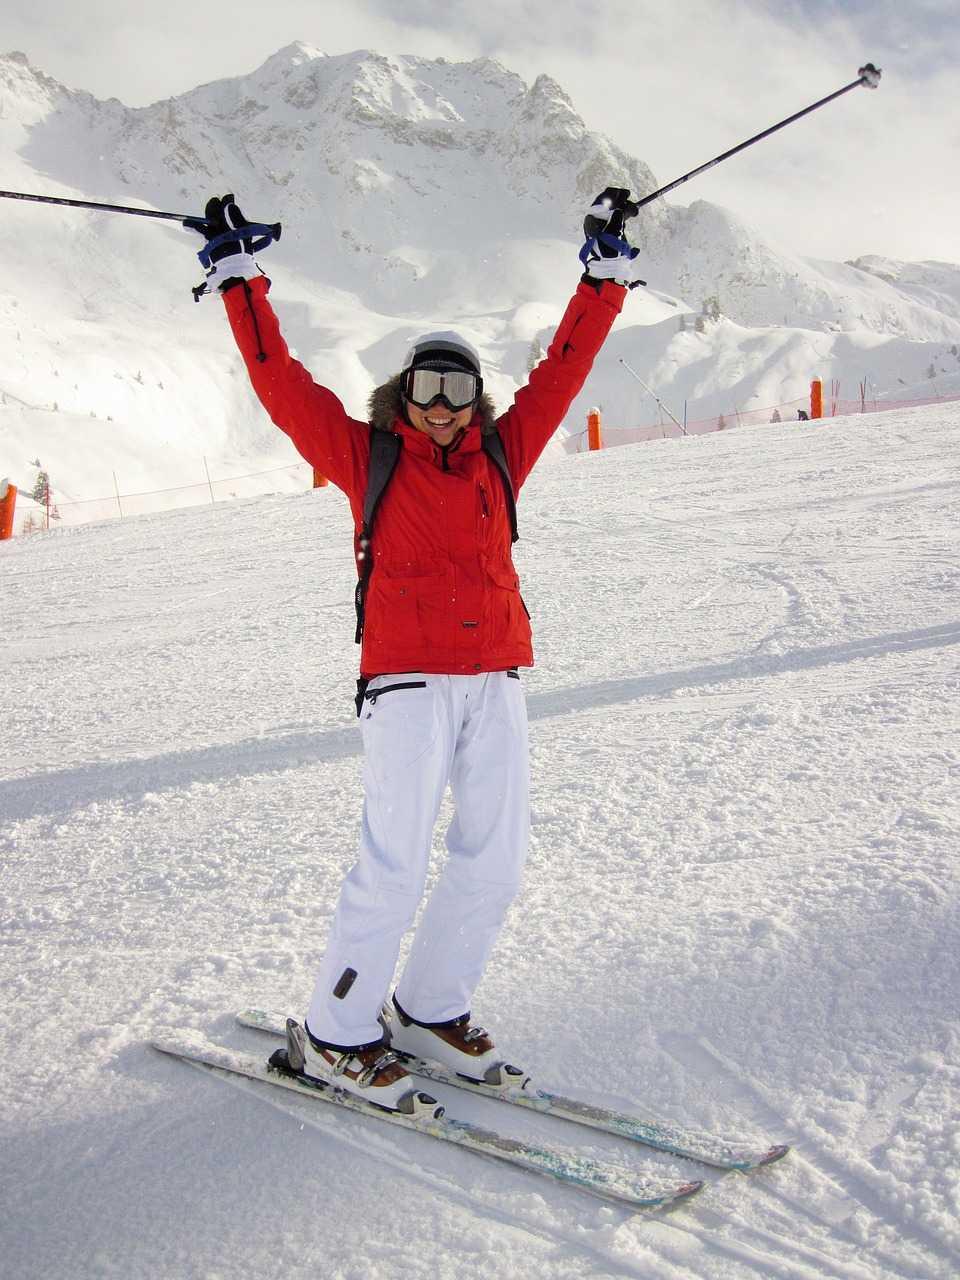 Jedla Bukowina - nauka jazdy na nartach